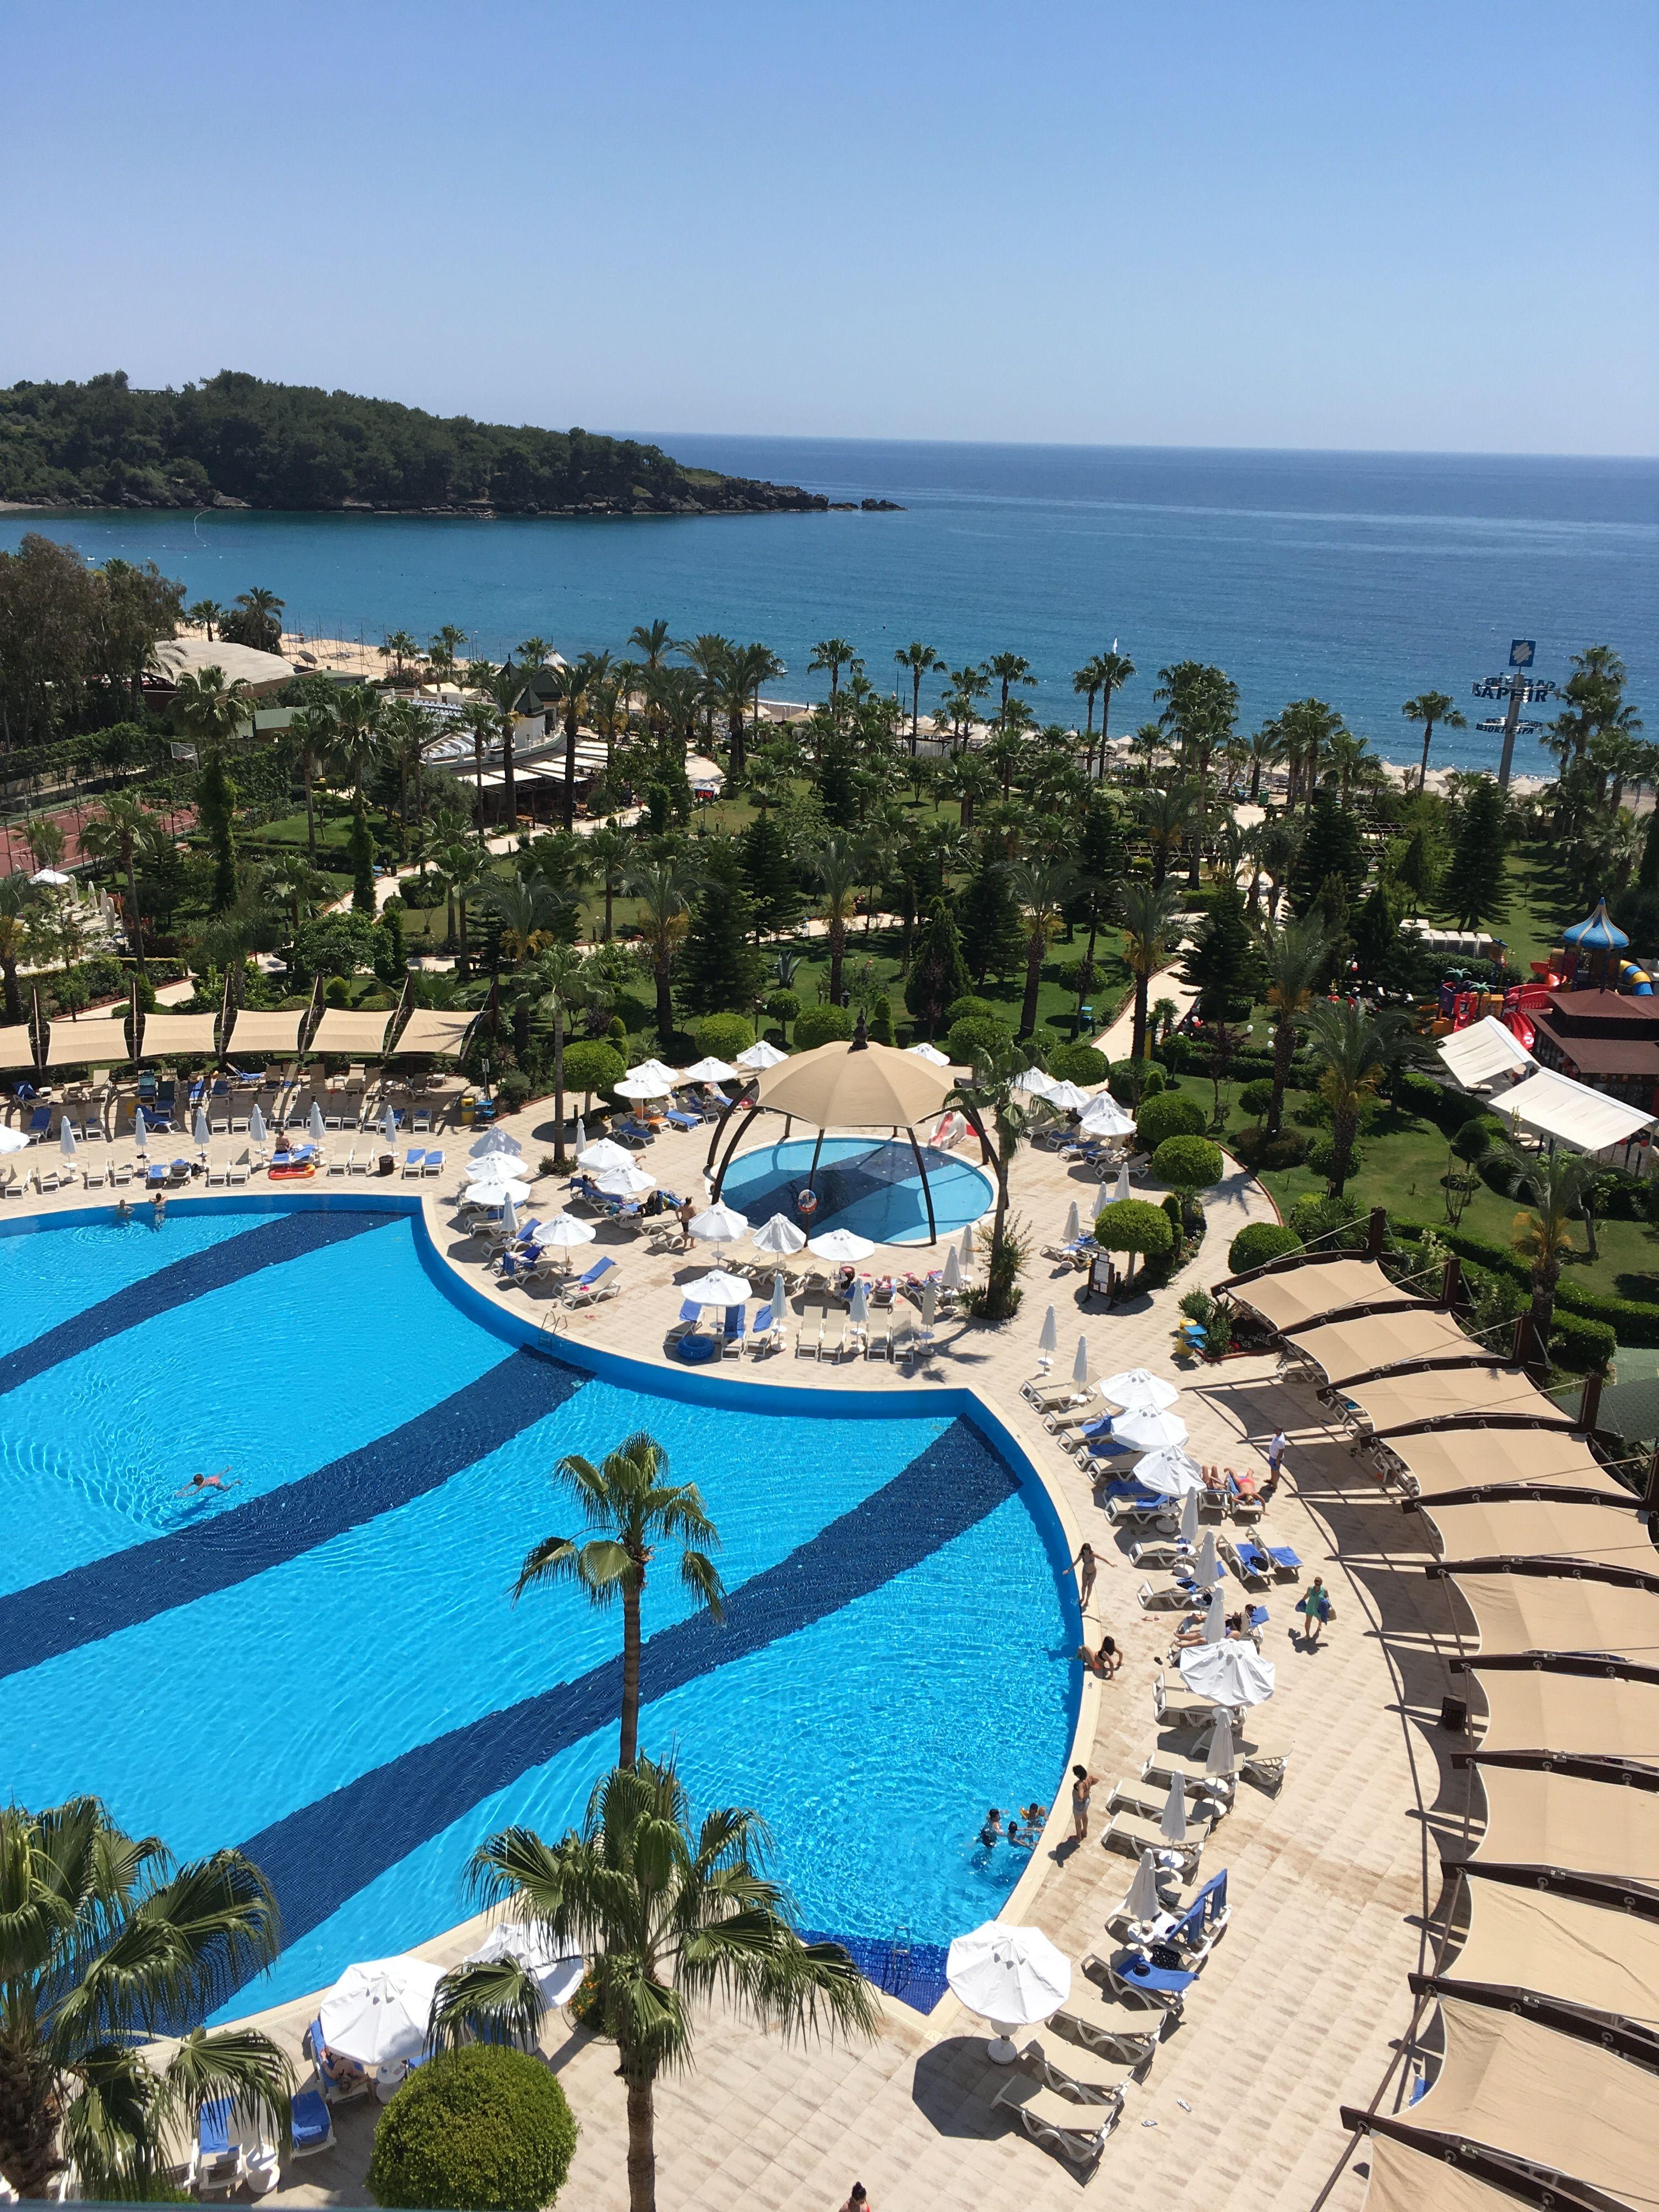 Saphir resort and spa  Saphir Resort  Spa viebutis